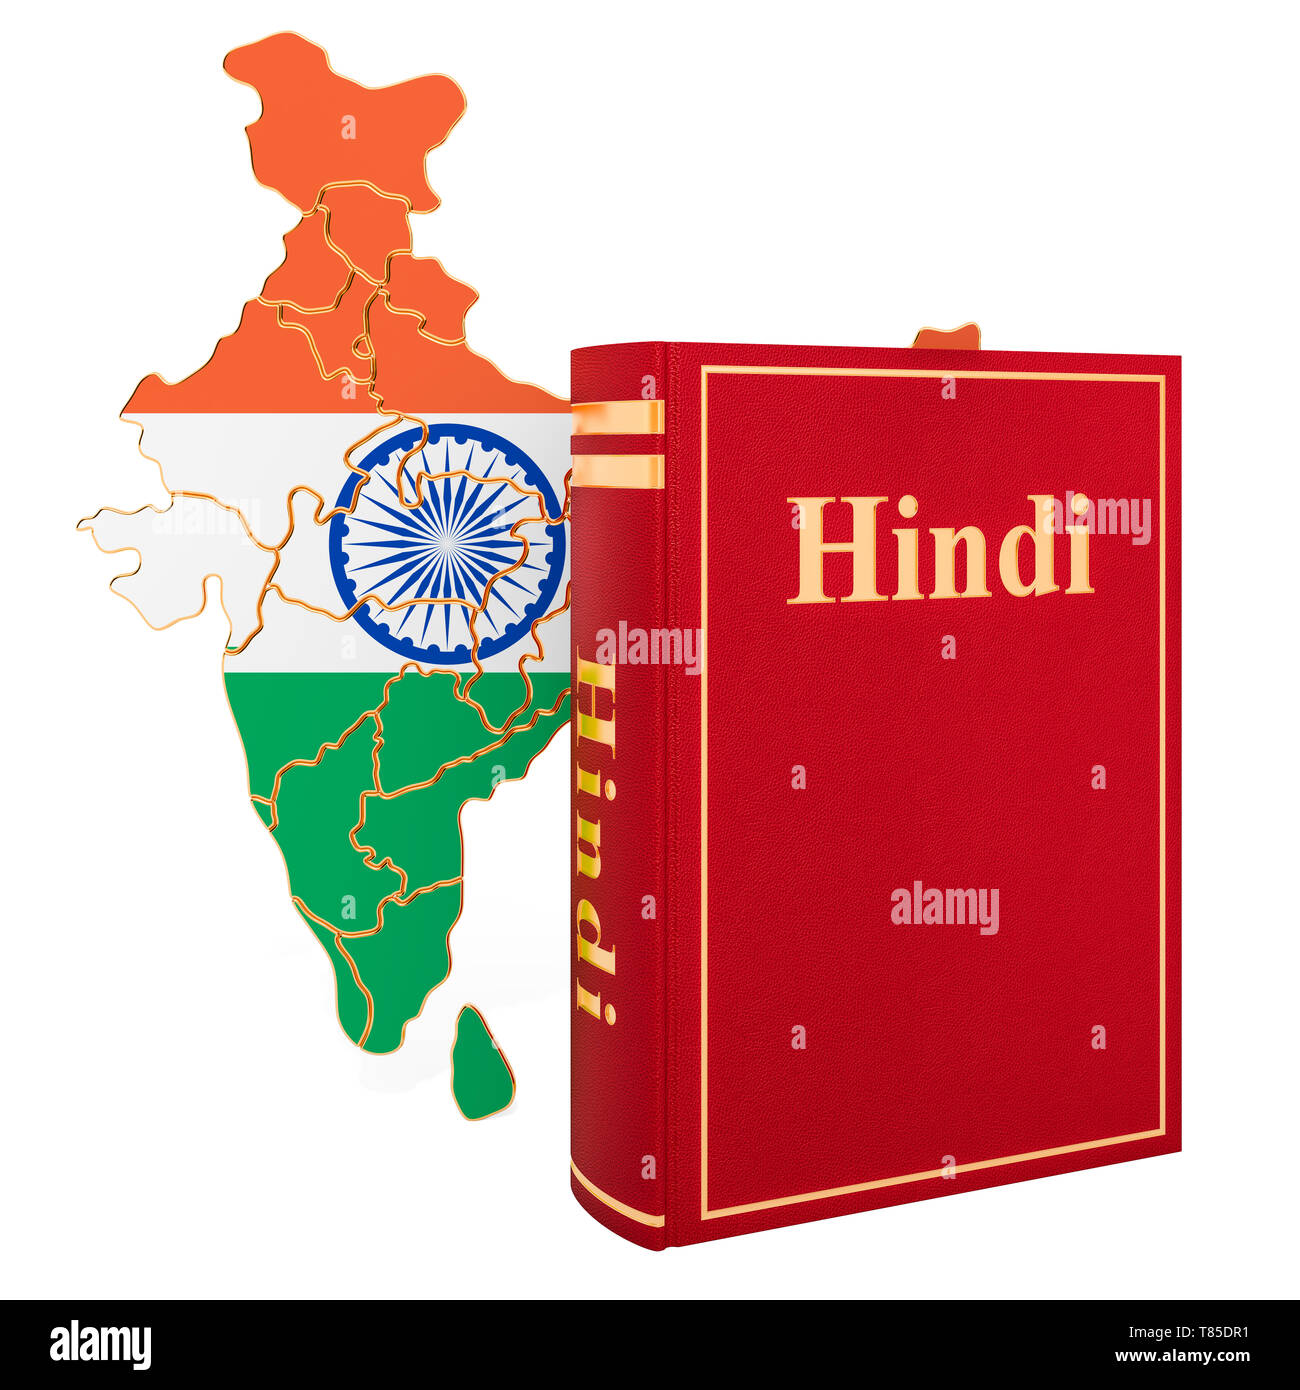 Hindi Language Stock Photos & Hindi Language Stock Images